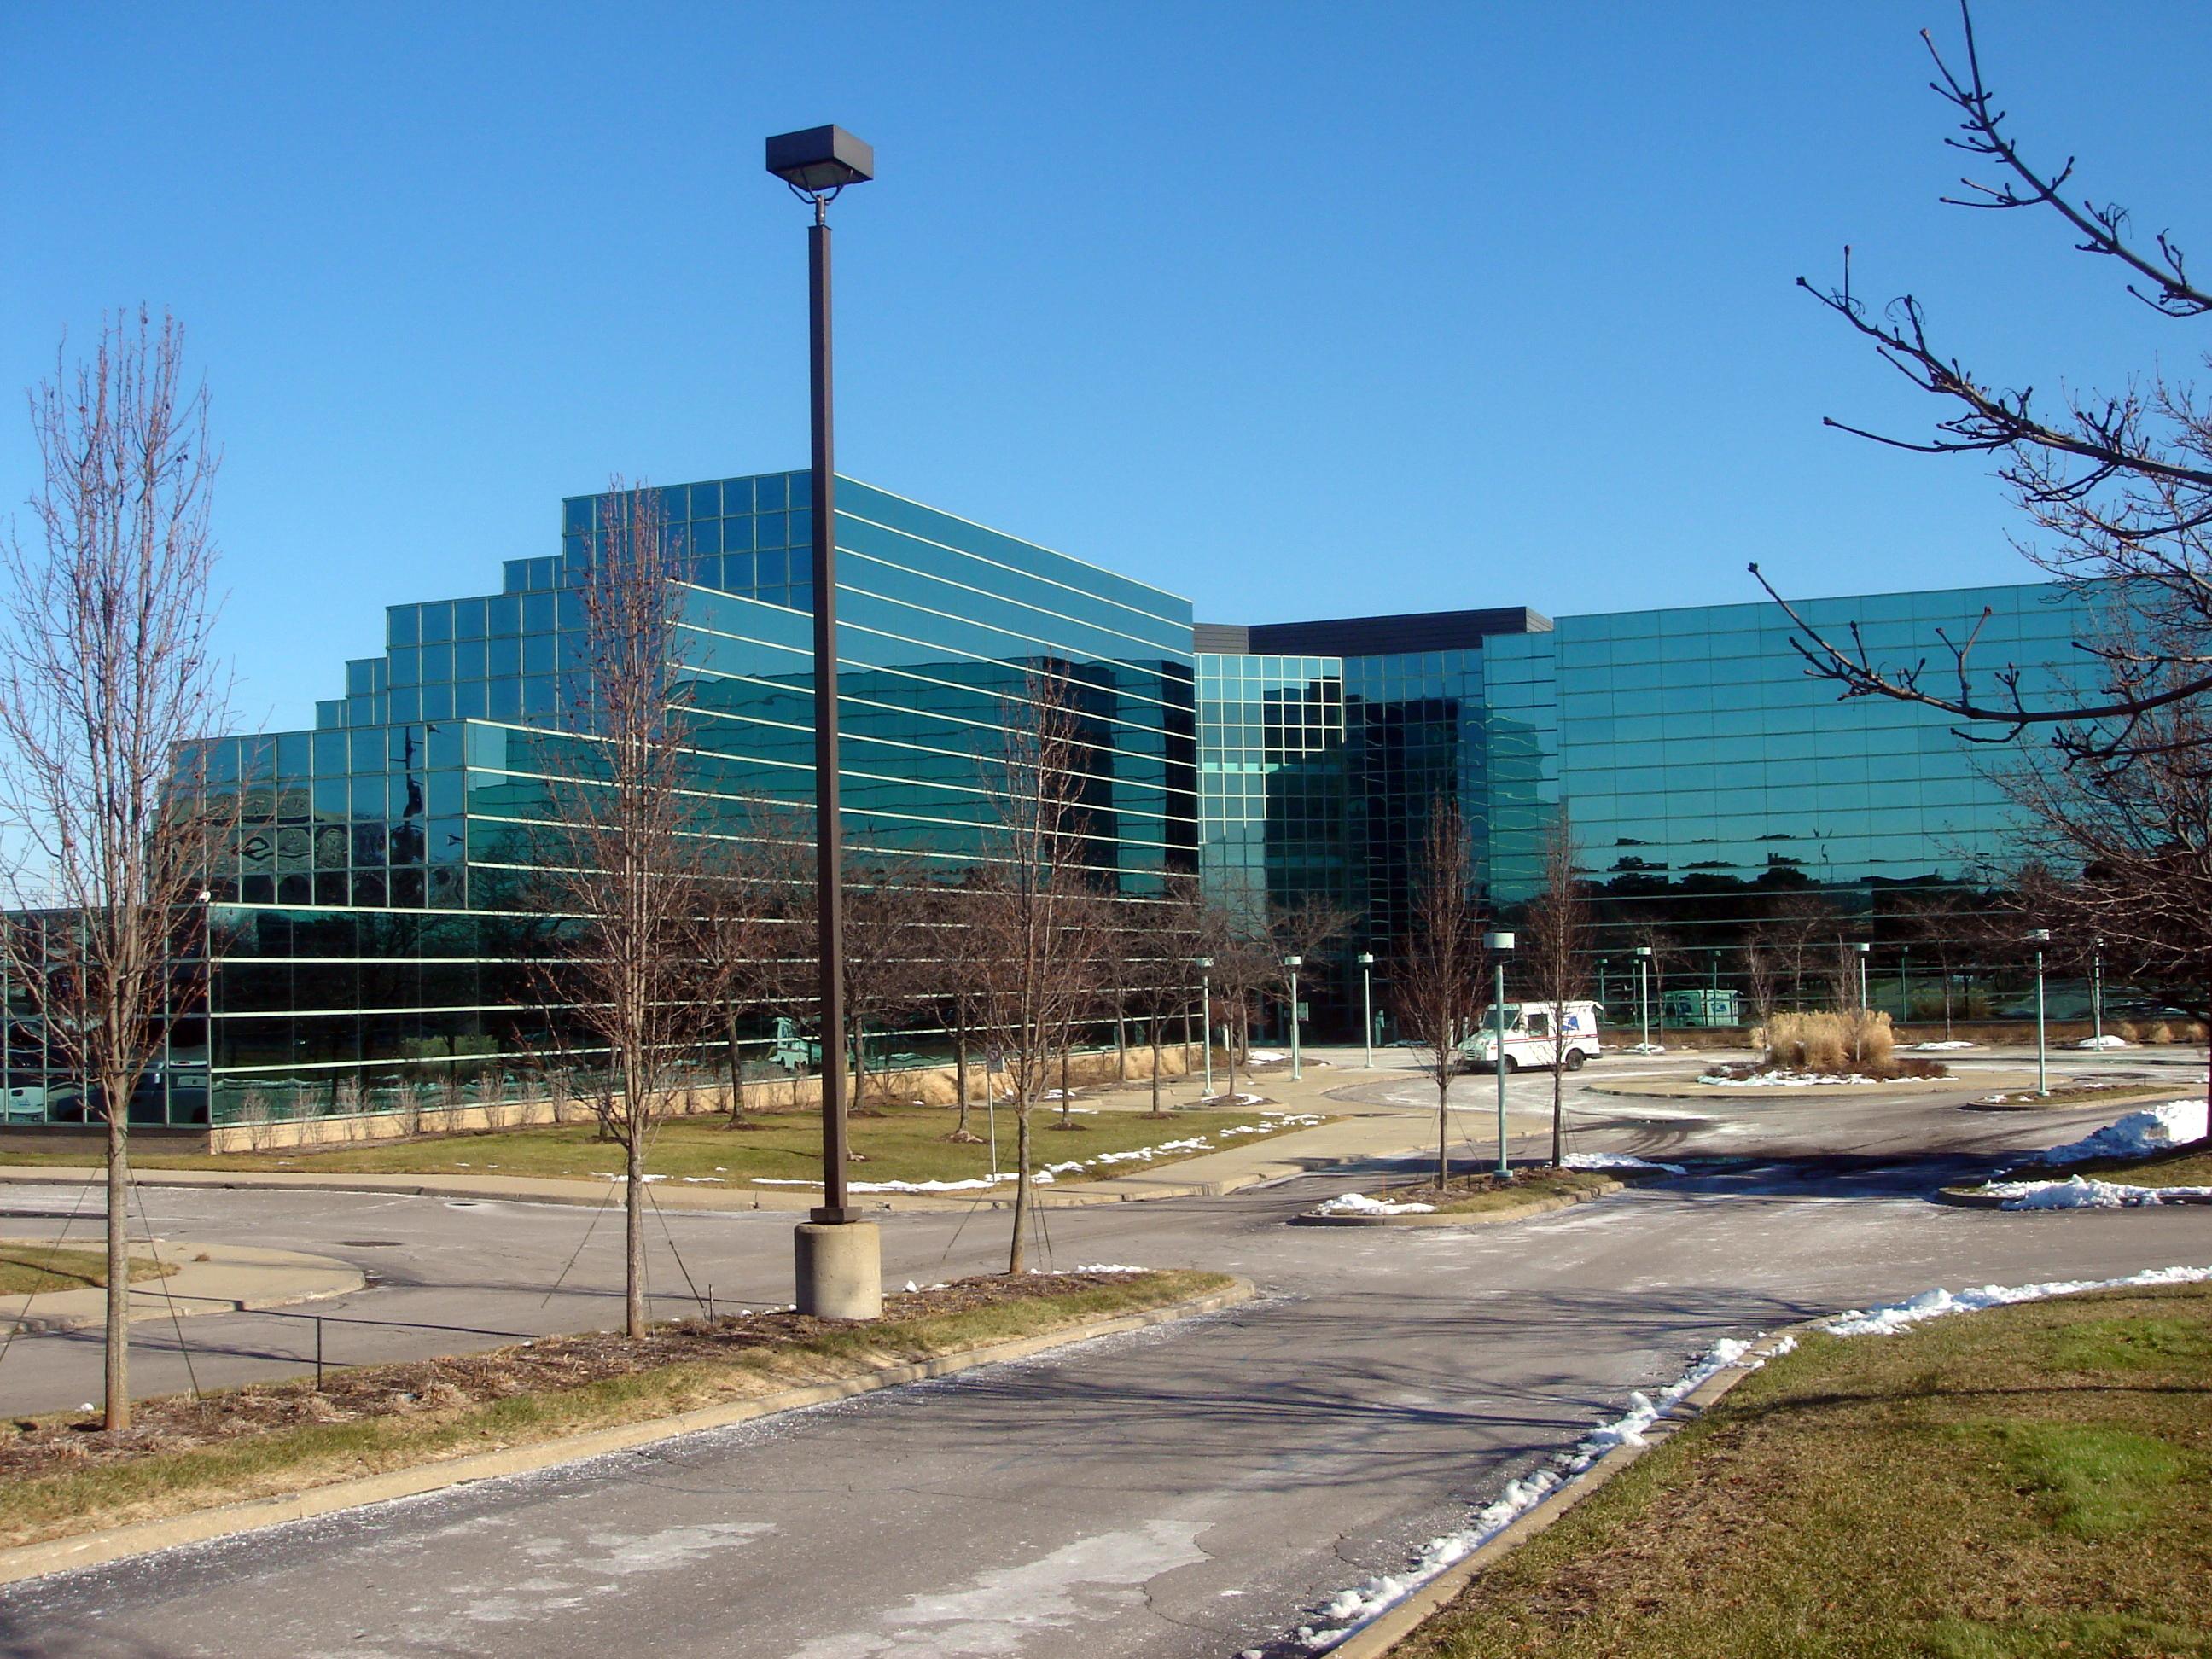 Livonia Michigan Familypedia Fandom Powered By Wikia